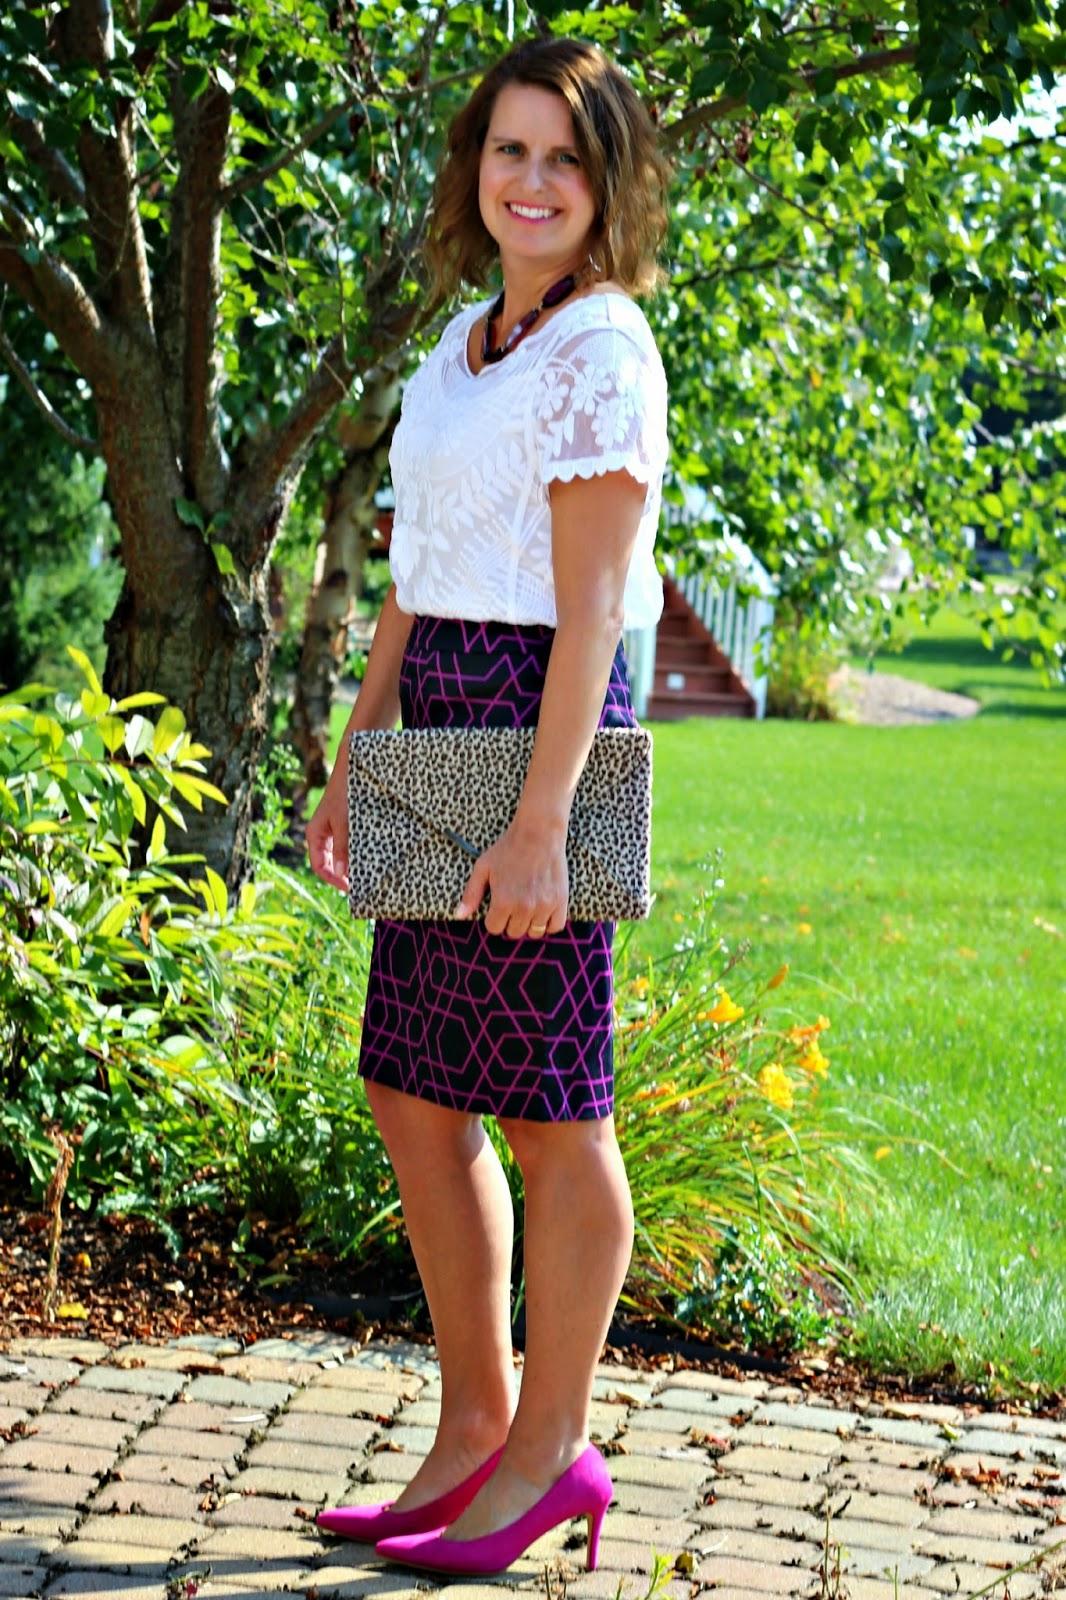 J Crew Factory Purple skirt, Express lace baroque blouse, pink pumps, purple agate slice necklace